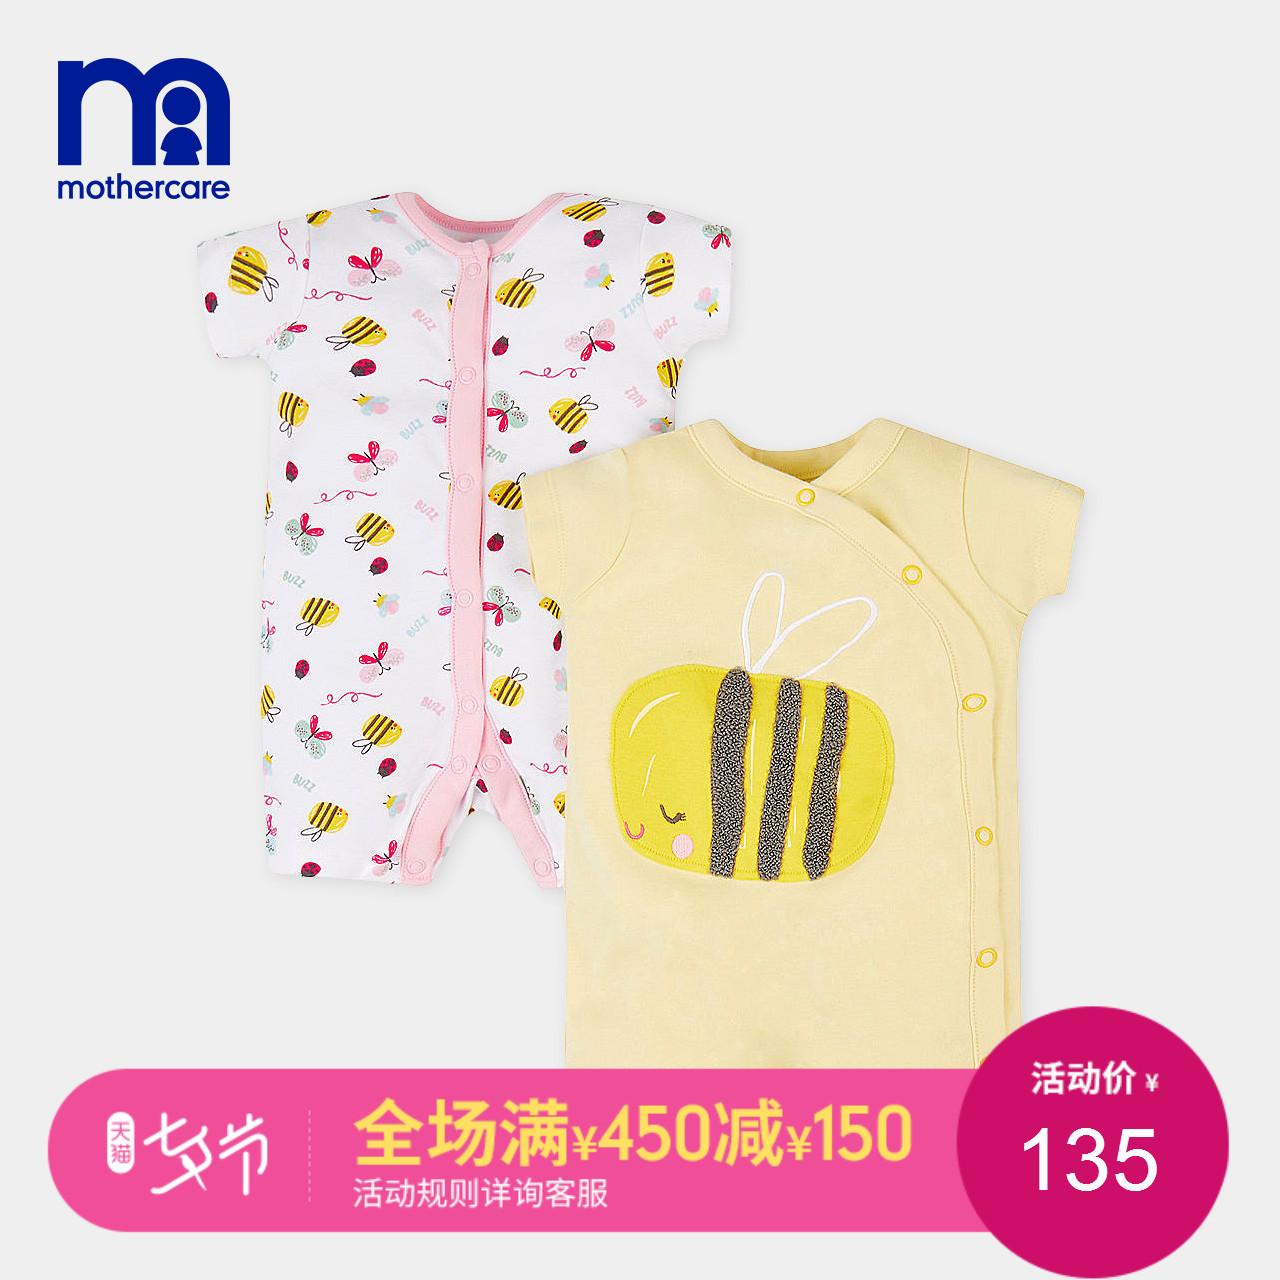 mothercare婴儿衣服男女宝宝连体衣夏季哈衣短袖新生儿棉质包屁衣